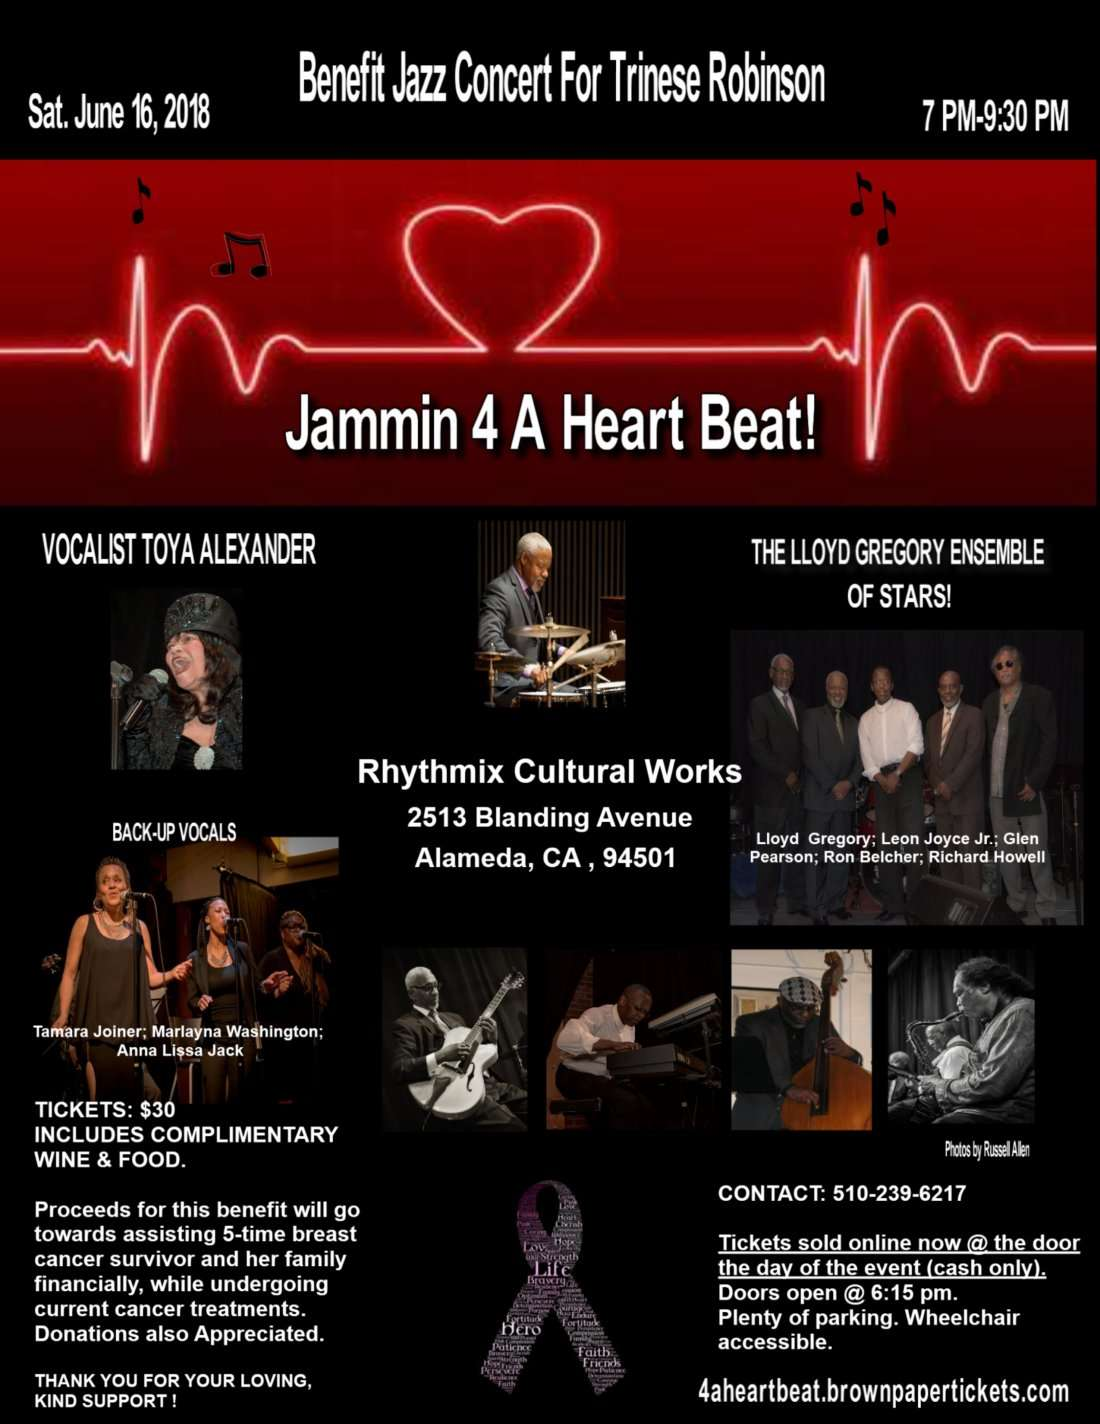 Jammin 4 A Heart Beat